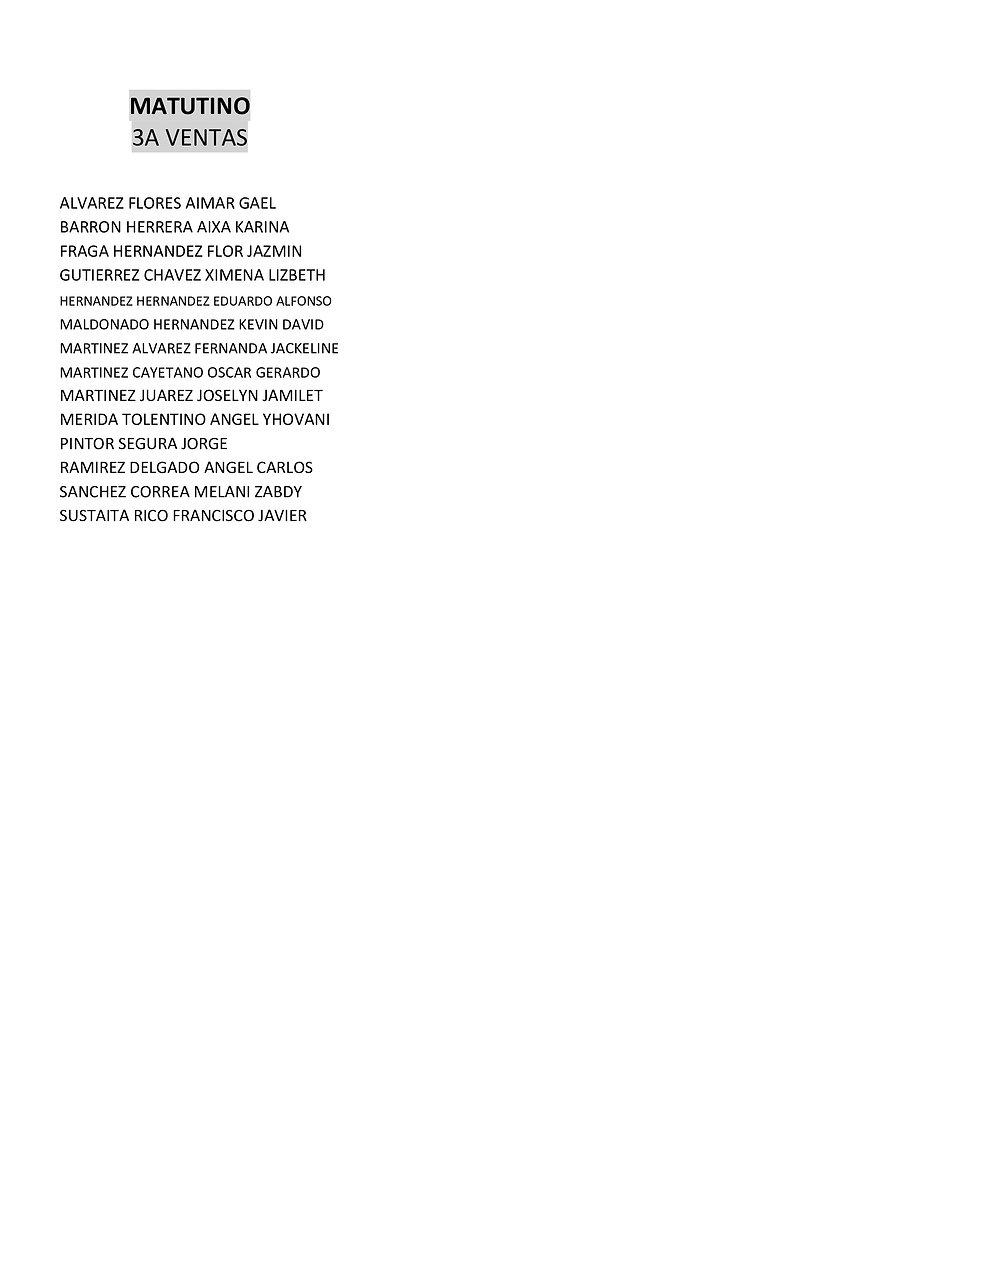 LISTAS PARA PUBLICAR 3ero. MATUTINO (1)-3.jpg